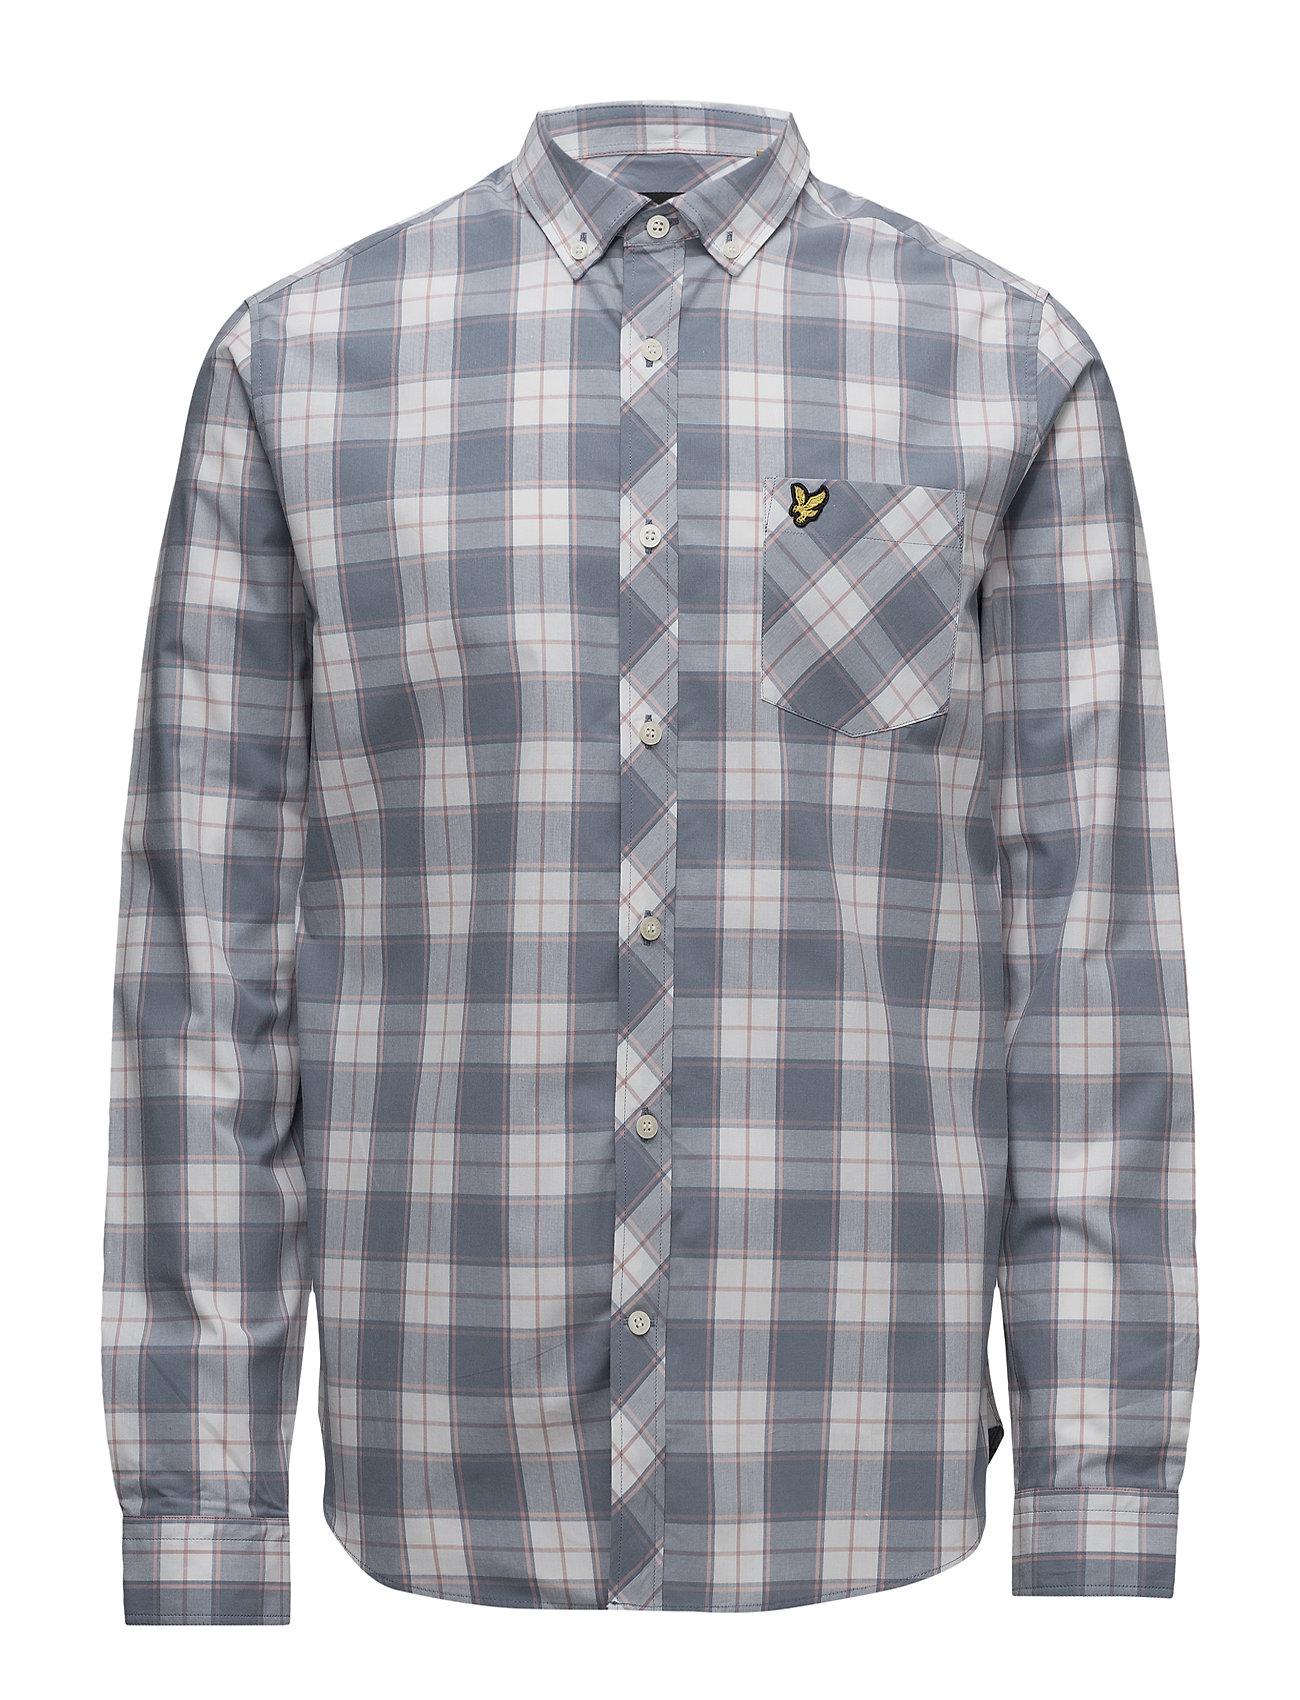 Lyle & Scott Check Shirt